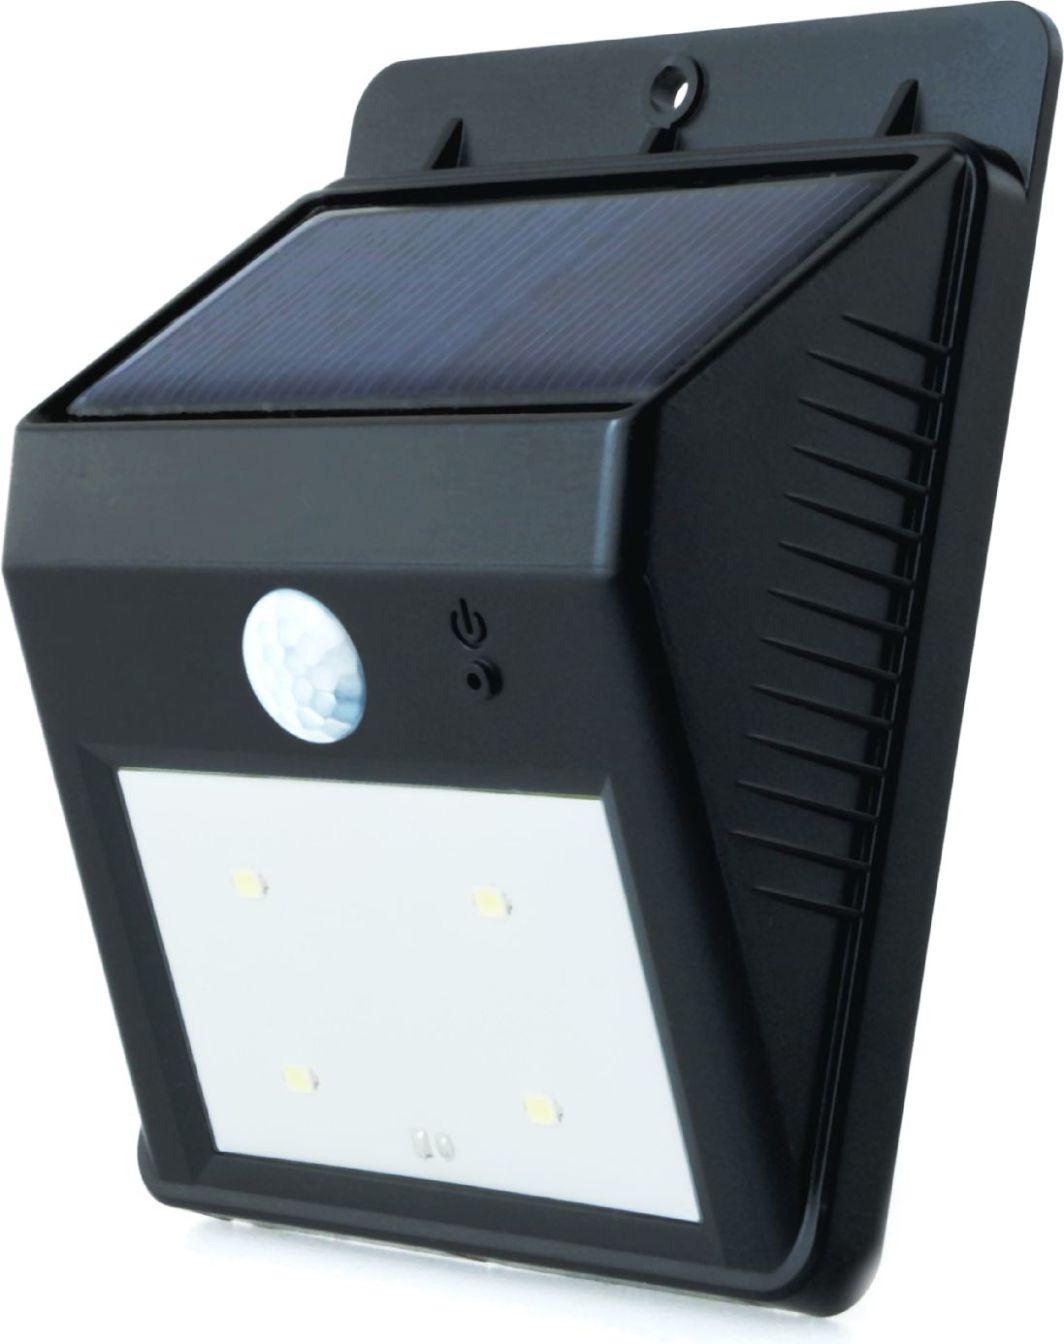 Kinkiet PowerNeed SMD LED 1x0.44W LED (SL09P) 1